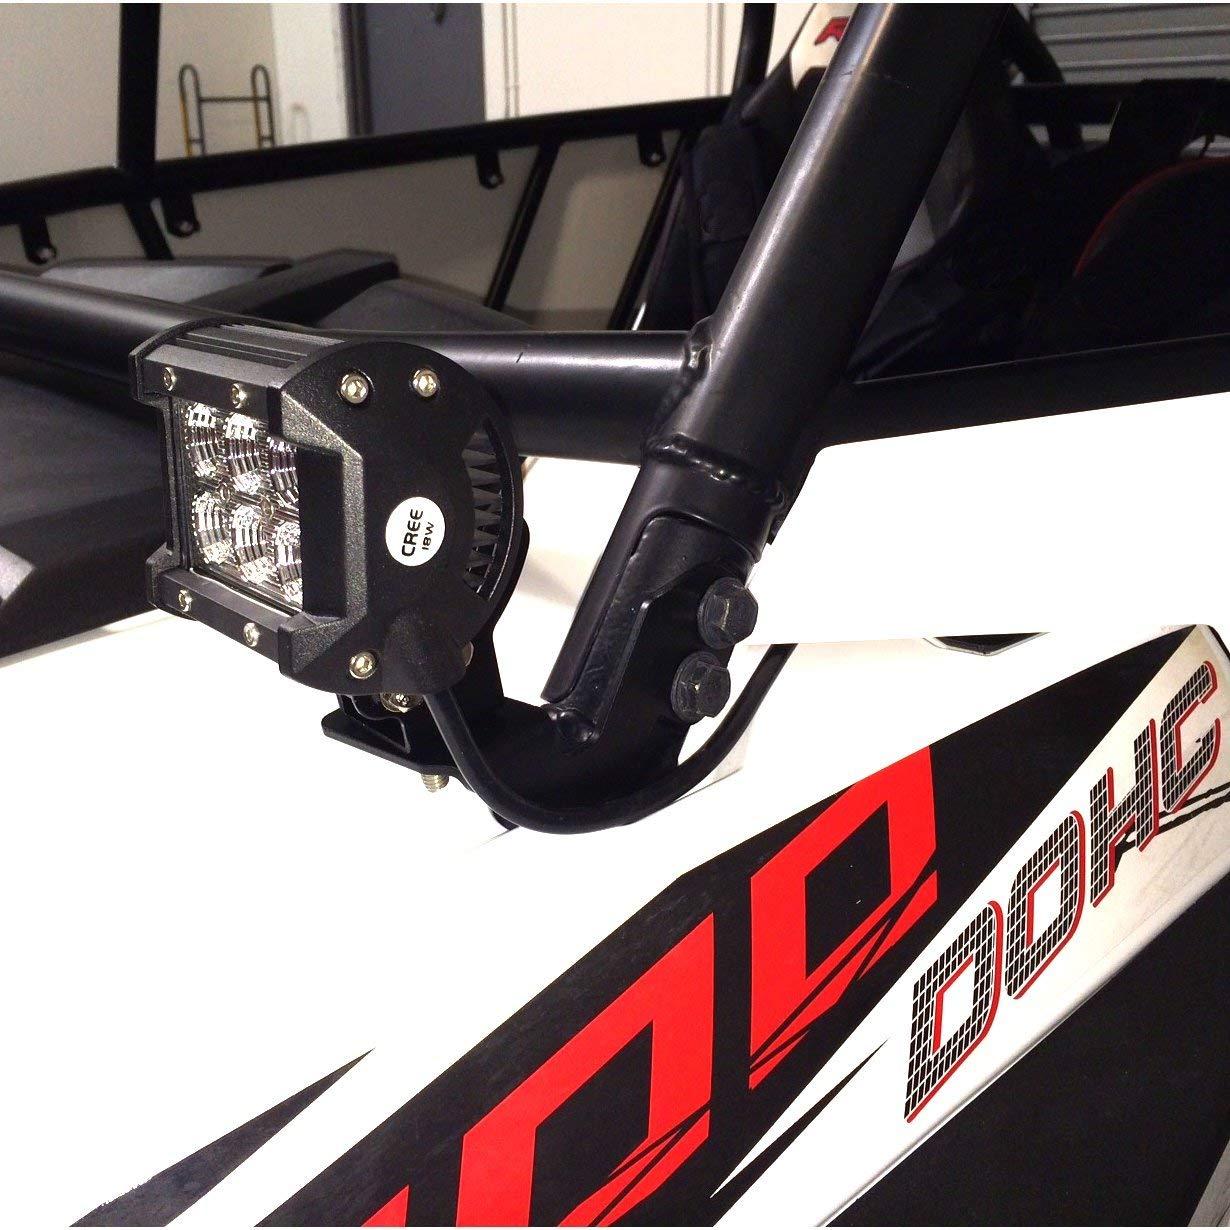 Driverwish LED Light Bar Mounting Brackets Kit for Polaris RZR XP 900 1000 Black